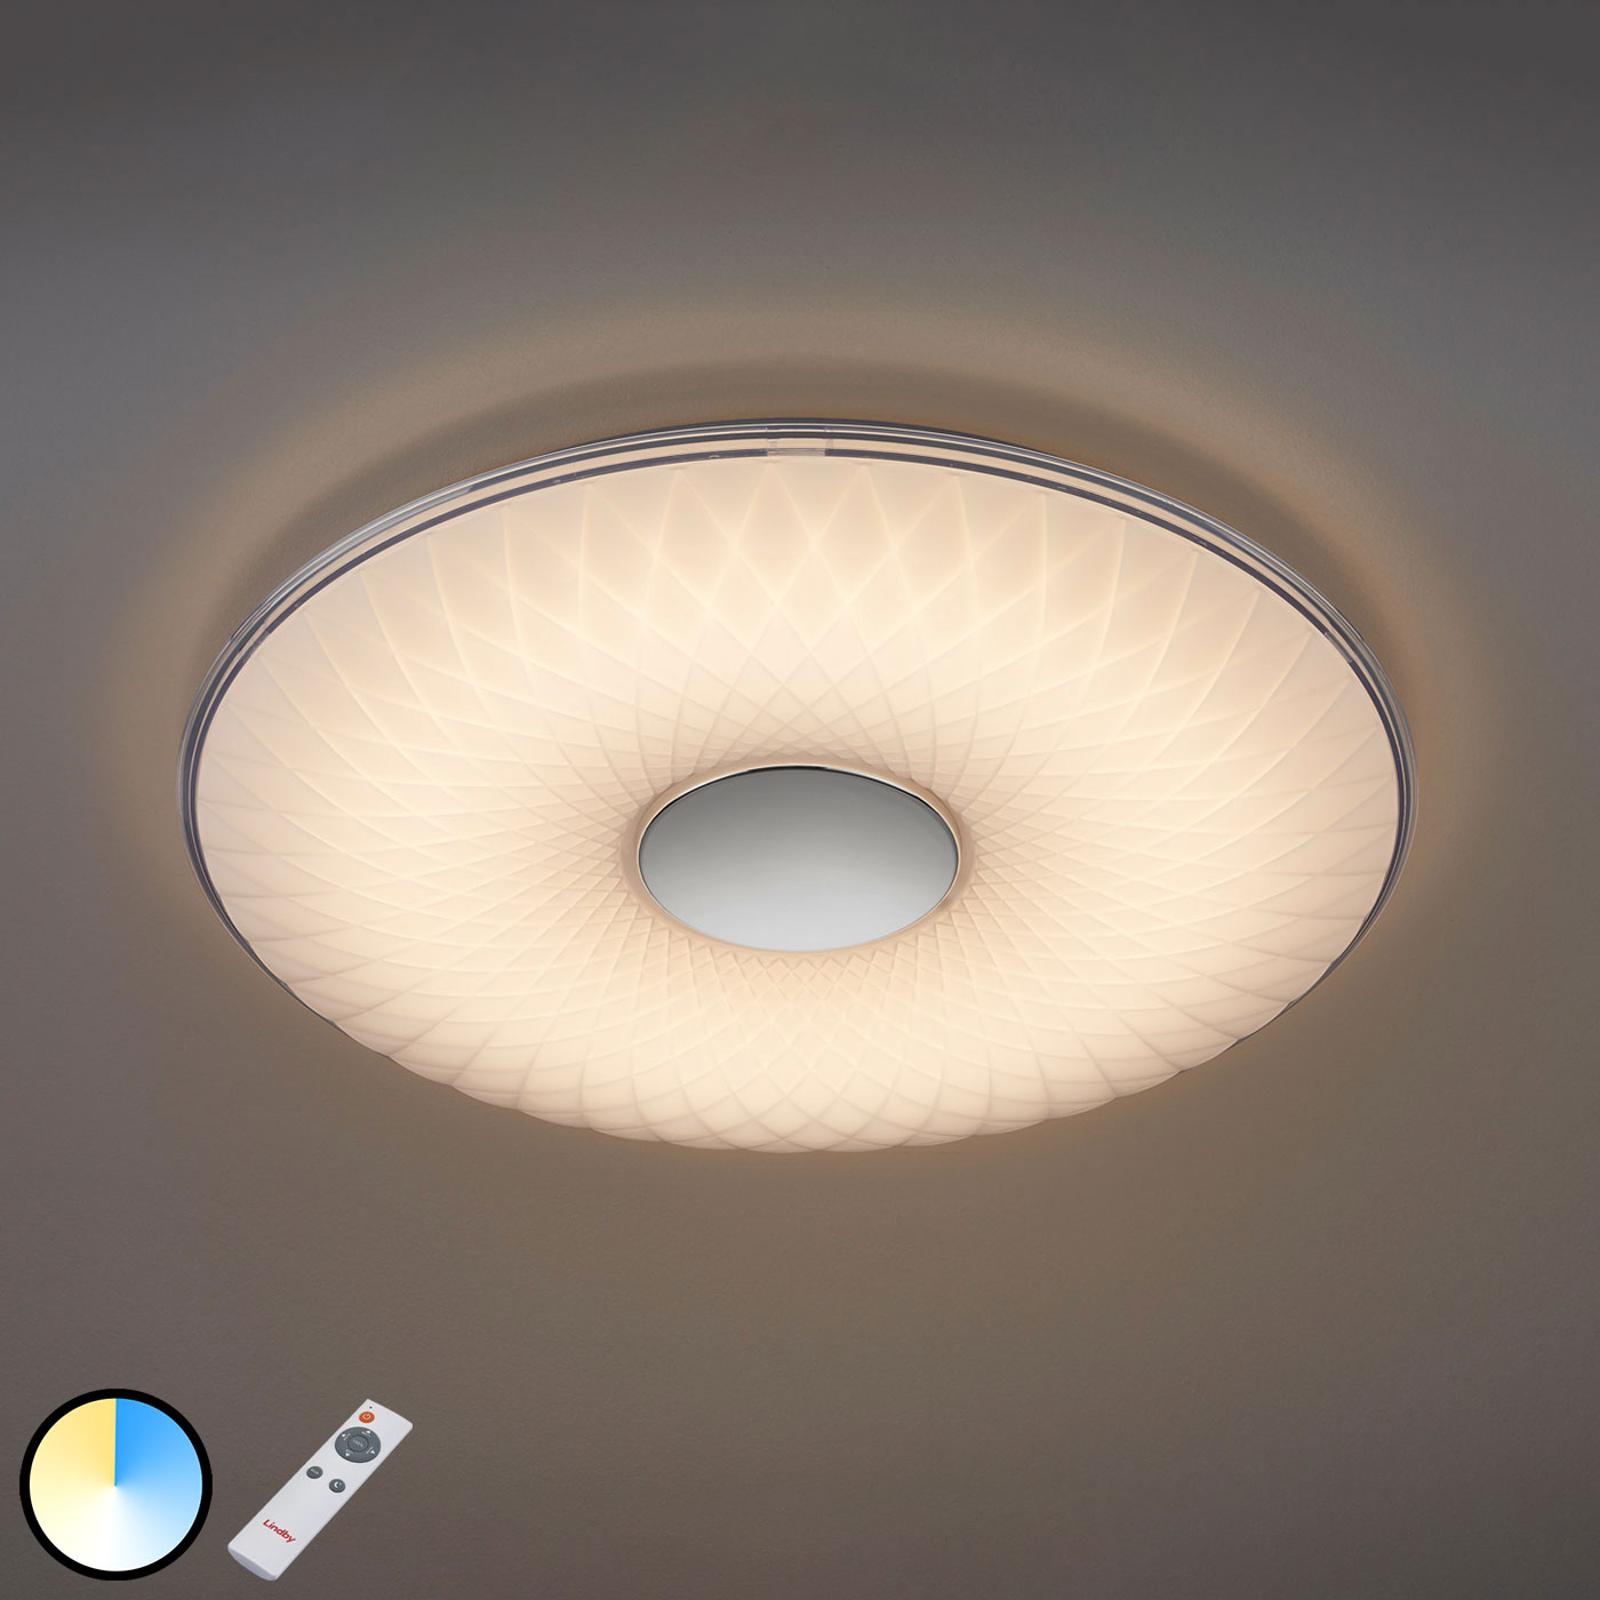 LED plafondlamp Tymon, 3.000-5.500 K, rond